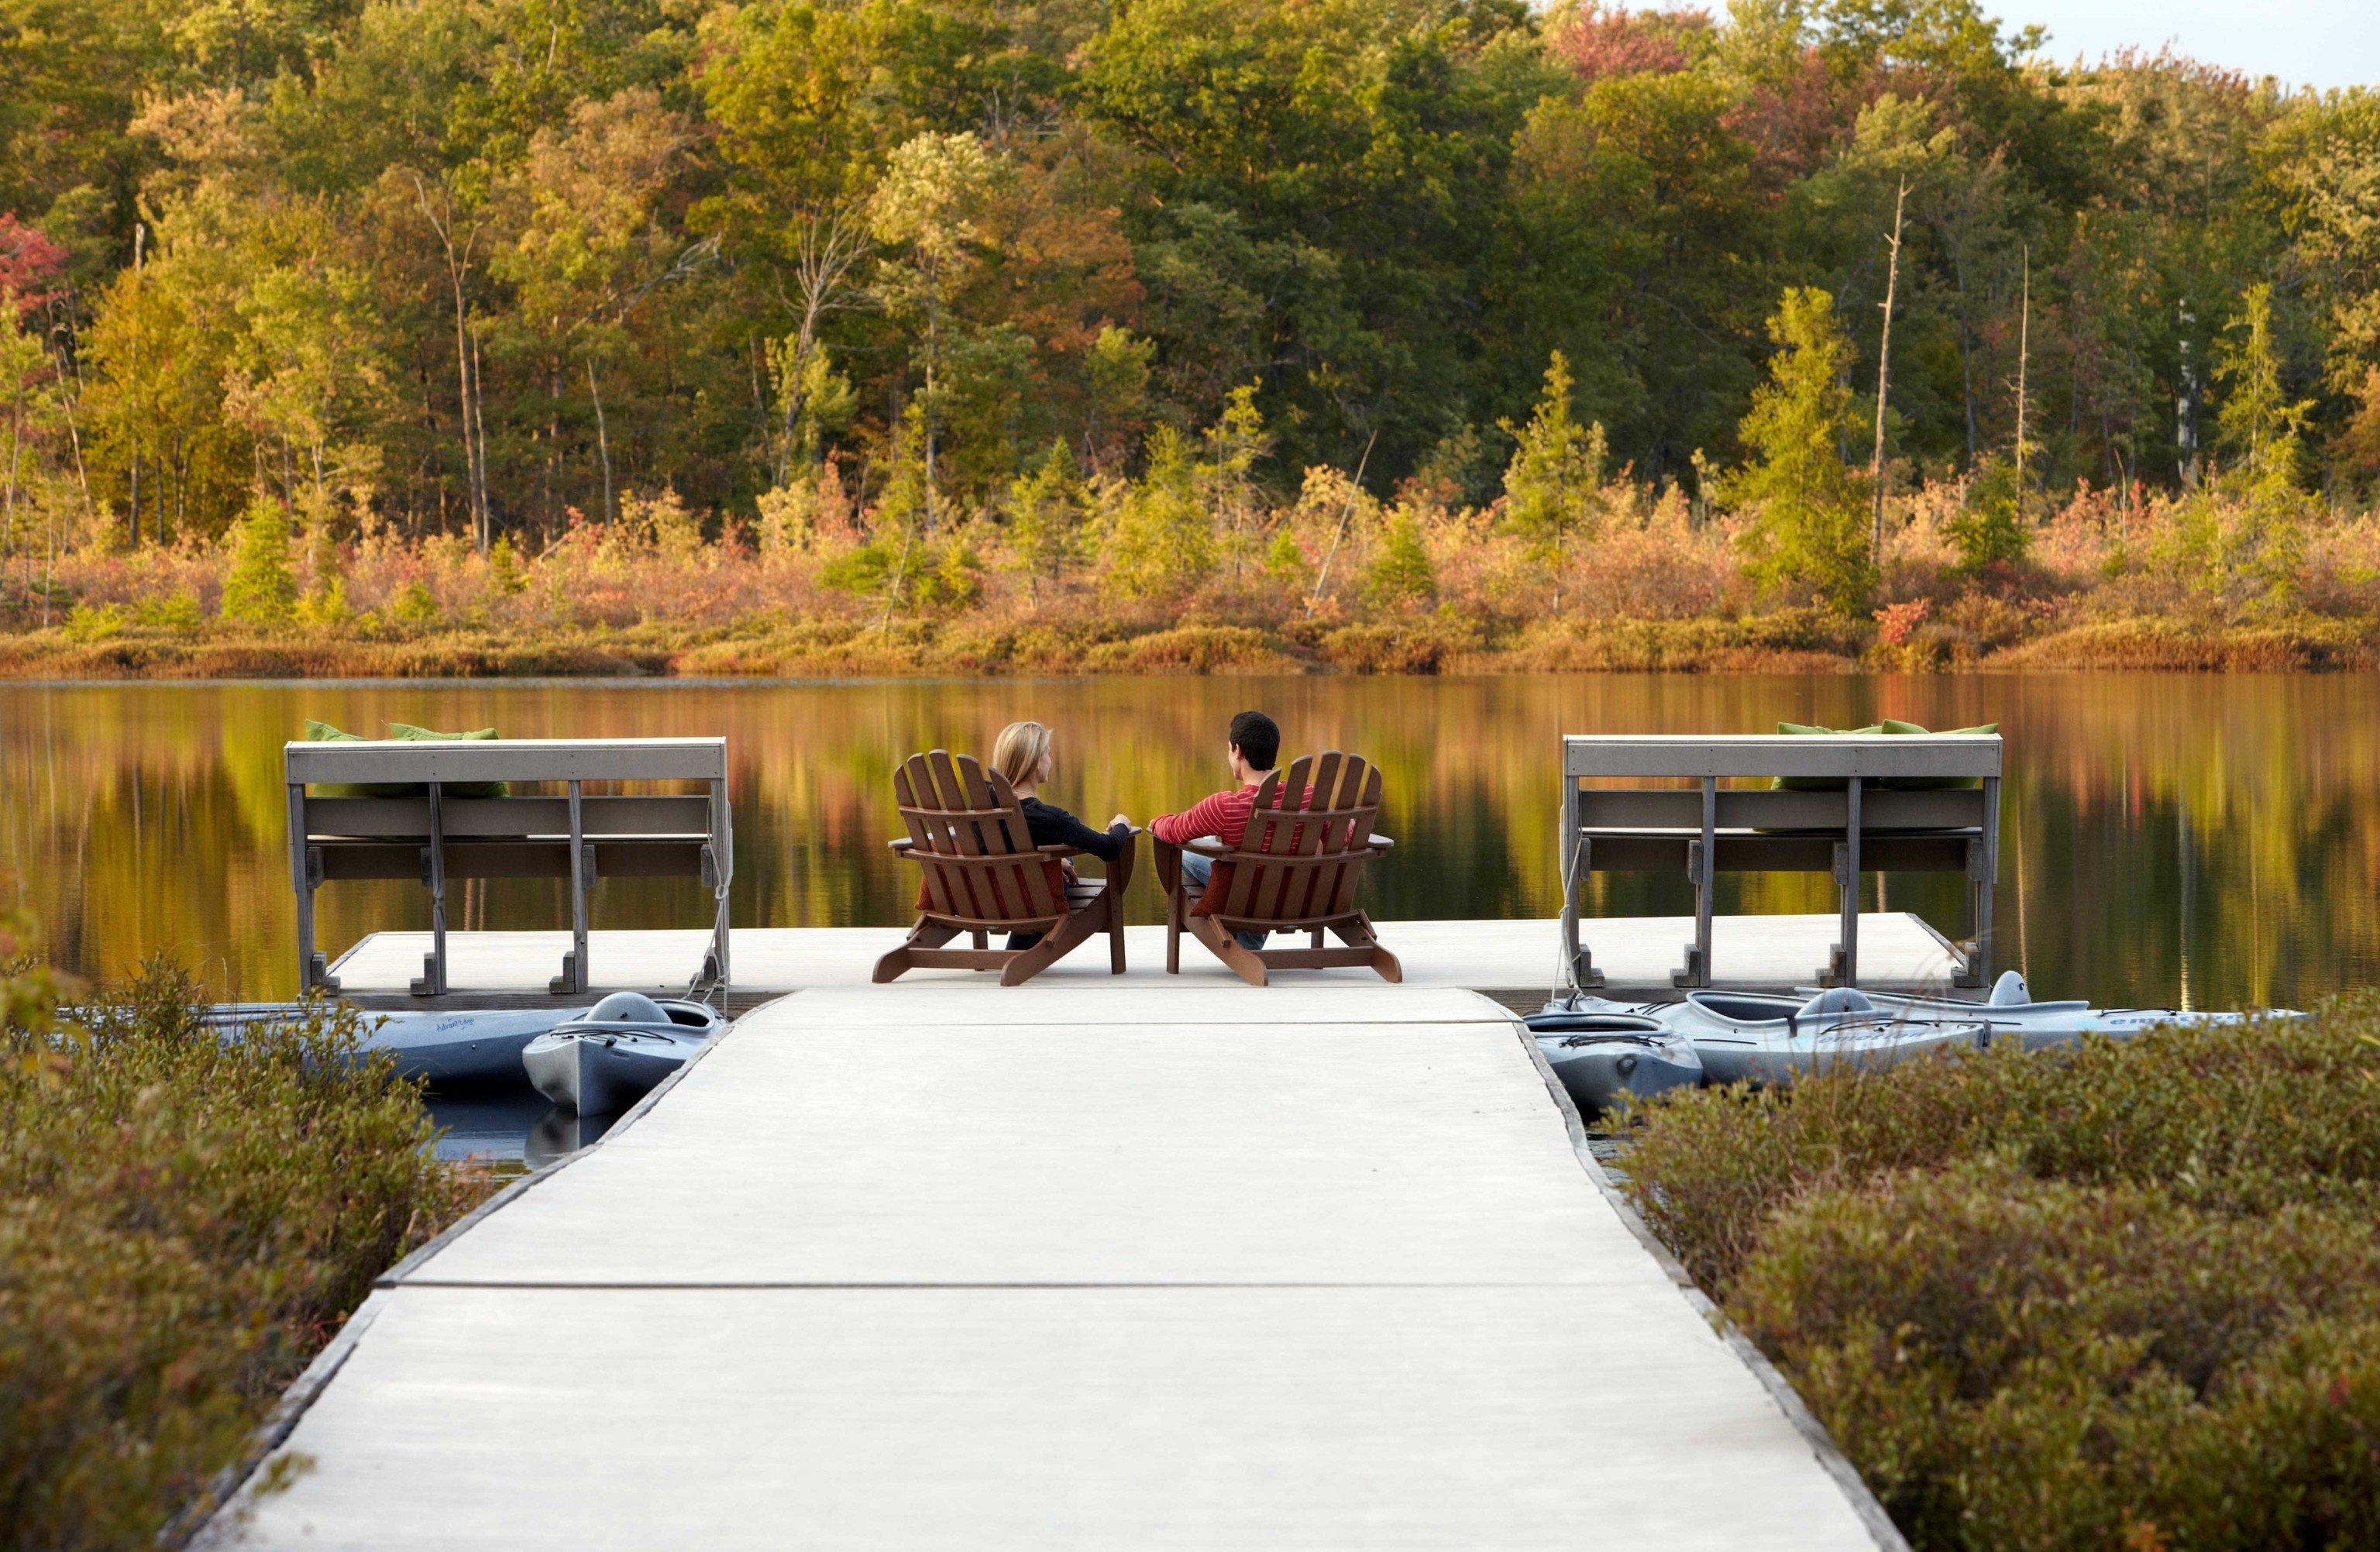 Romance Trip Ideas Weekend Getaways tree outdoor water grass River wilderness Lake park season pond vehicle waterway Boat reflection autumn overlooking